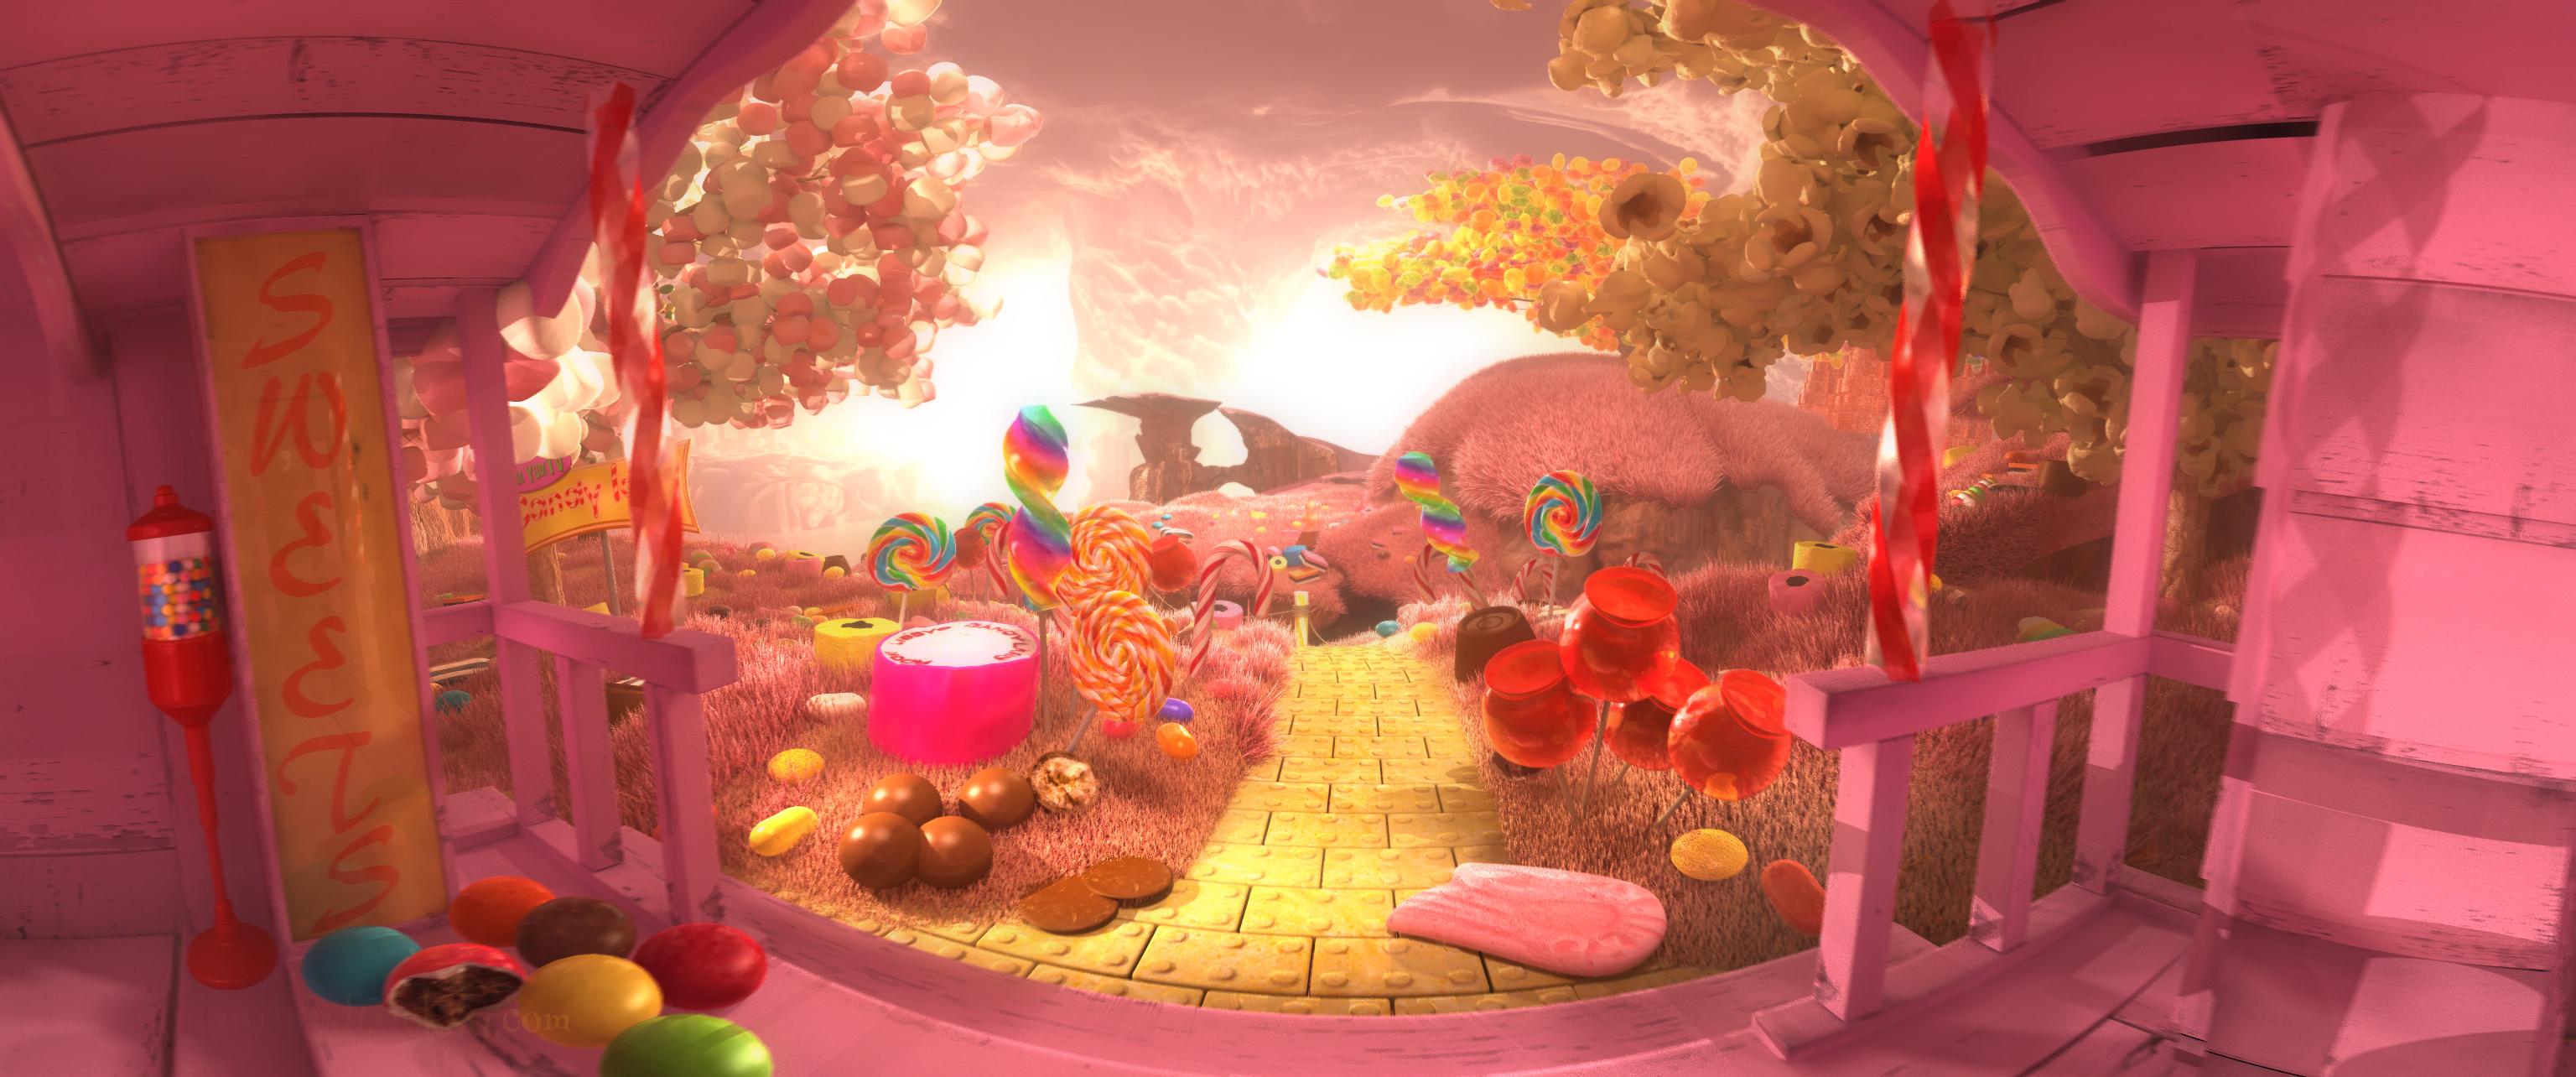 gangou&Tricksy_Candyland_VRworld02